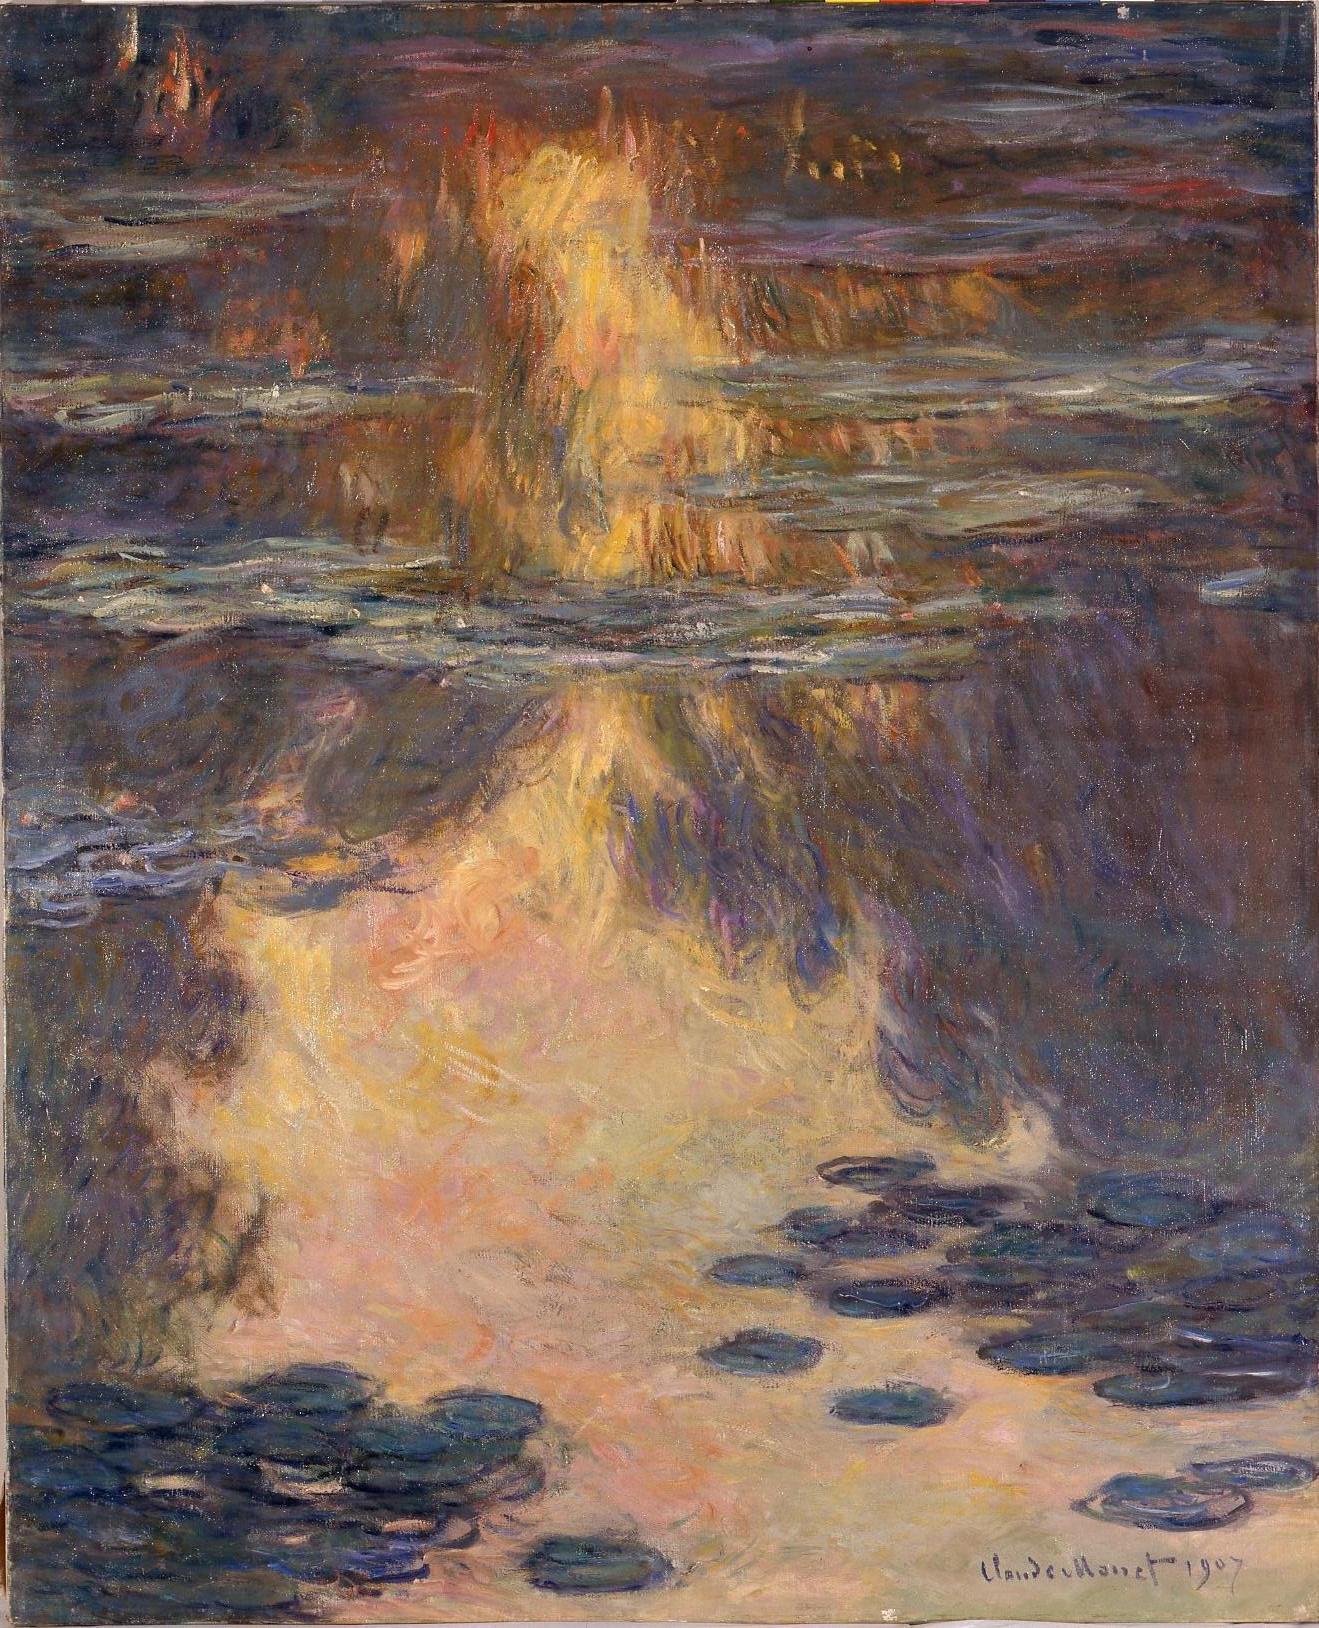 Ficheiro:Monet - Waterlilies, 1907, Kuboso.jpg – Wikipédia, a enciclopédia  livre